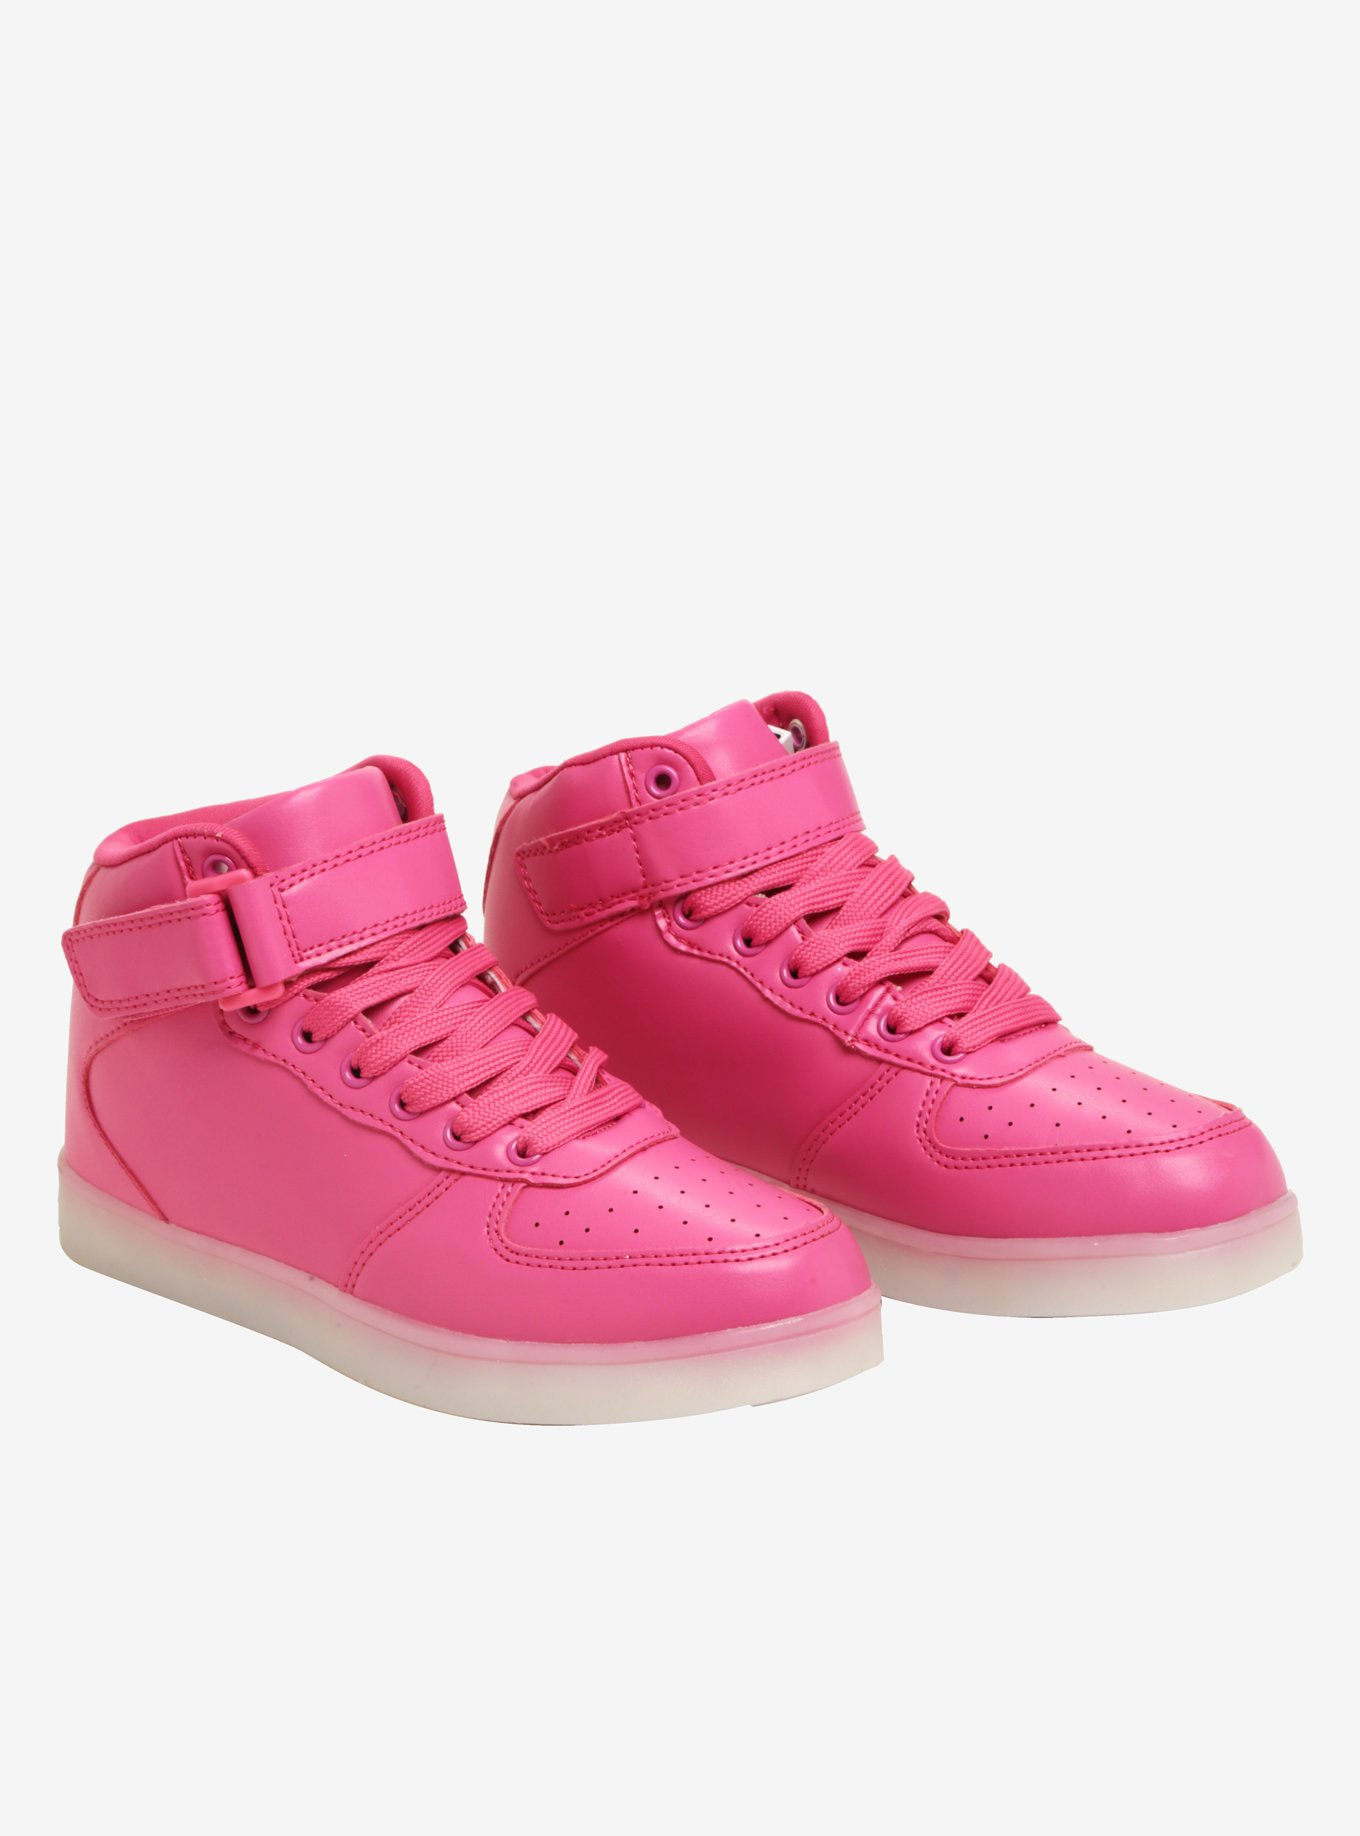 Pink Light-Up Hi-Top Sneakers